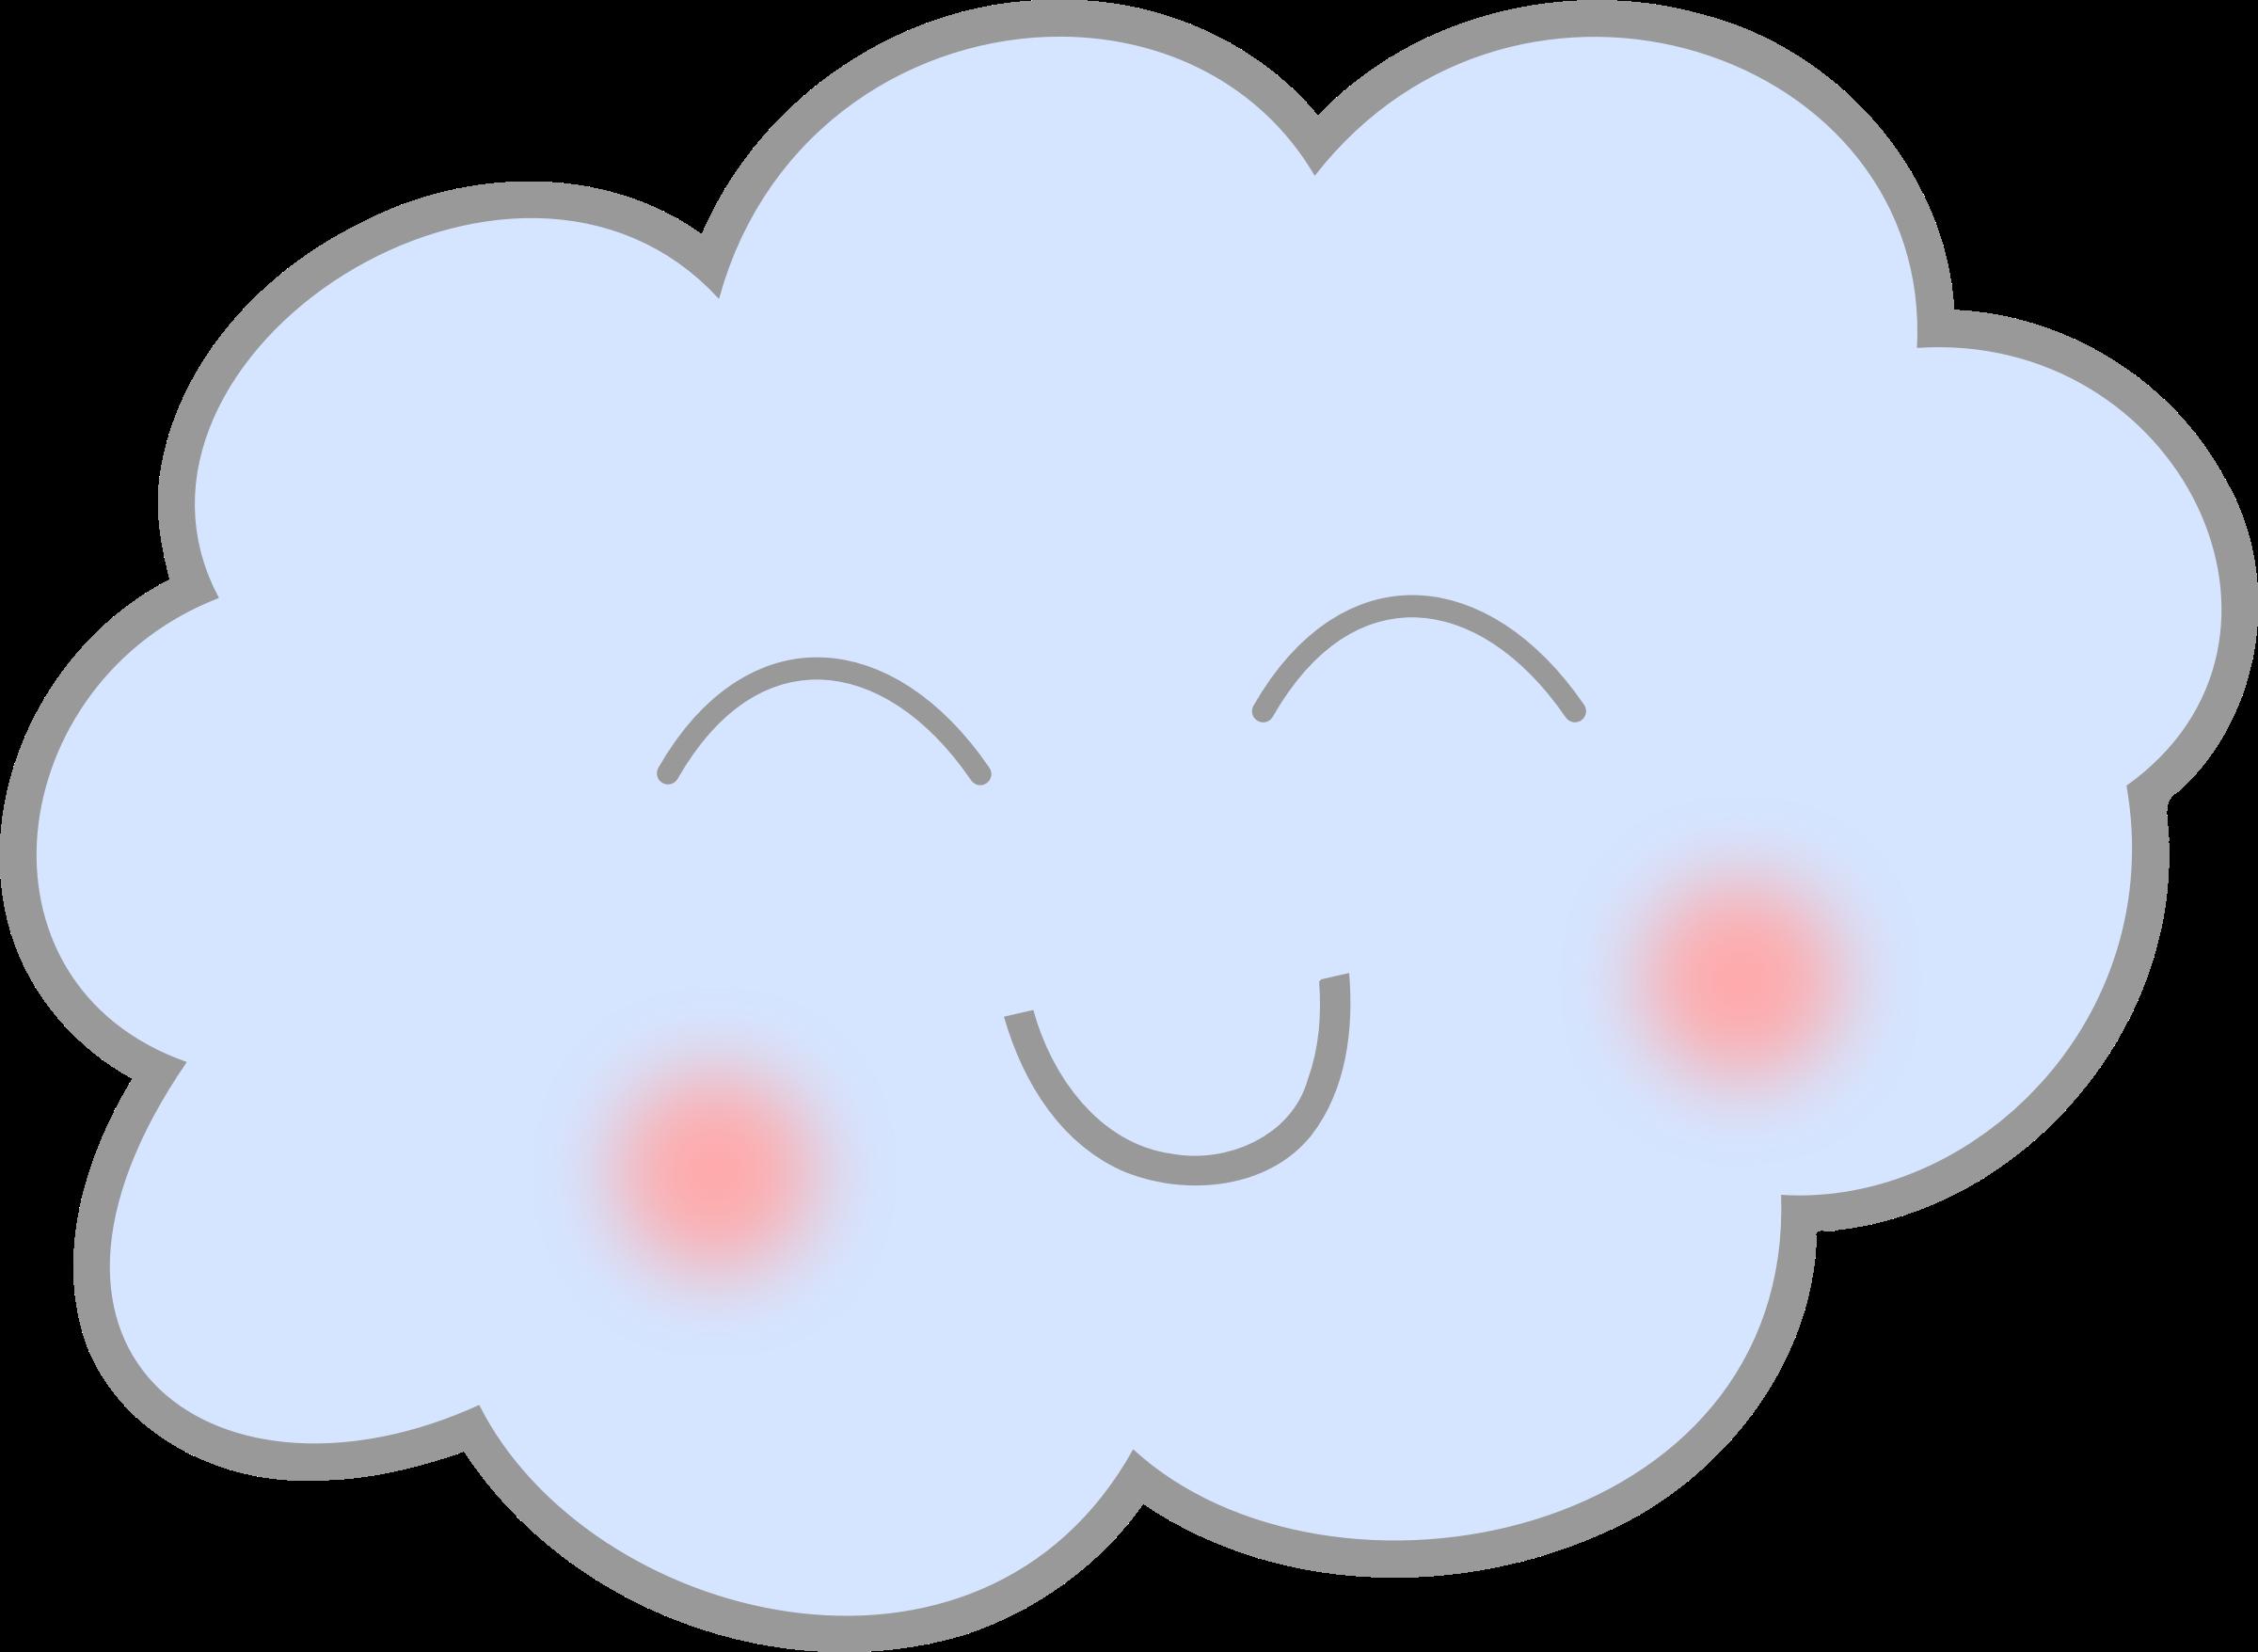 Top cloud clip art free clipart image